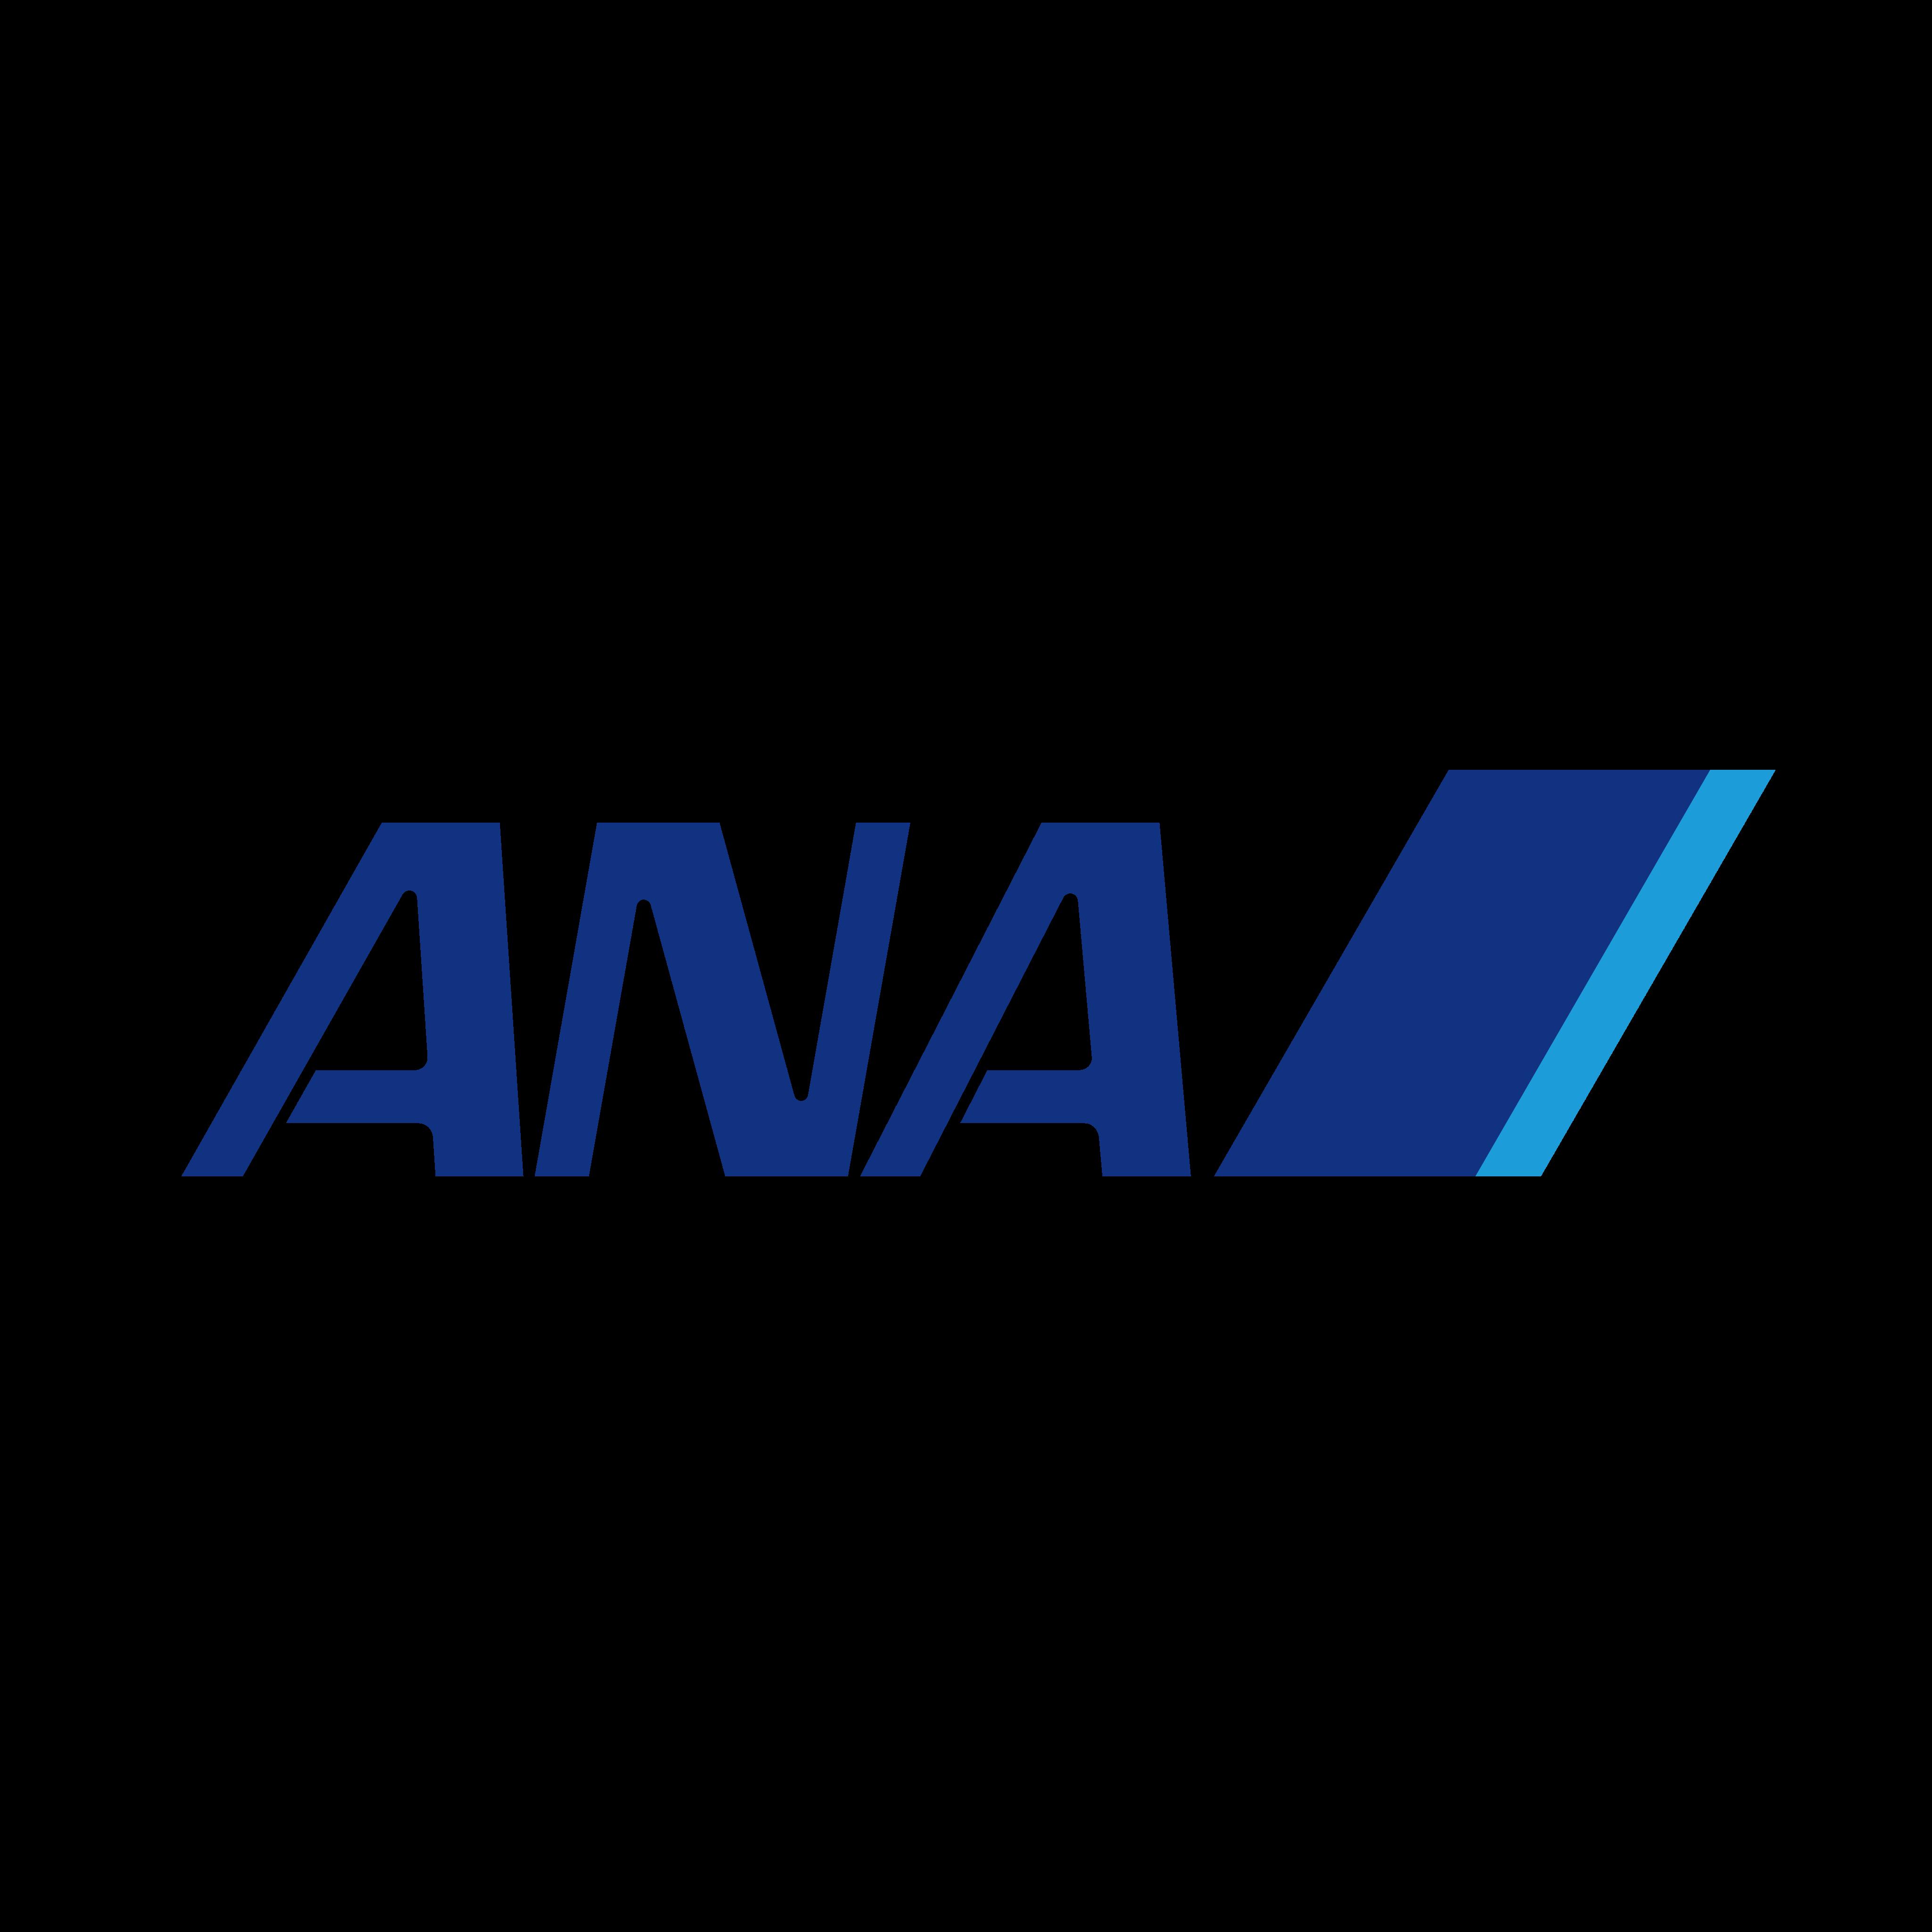 ana logo. All Nippon Airways Logo.